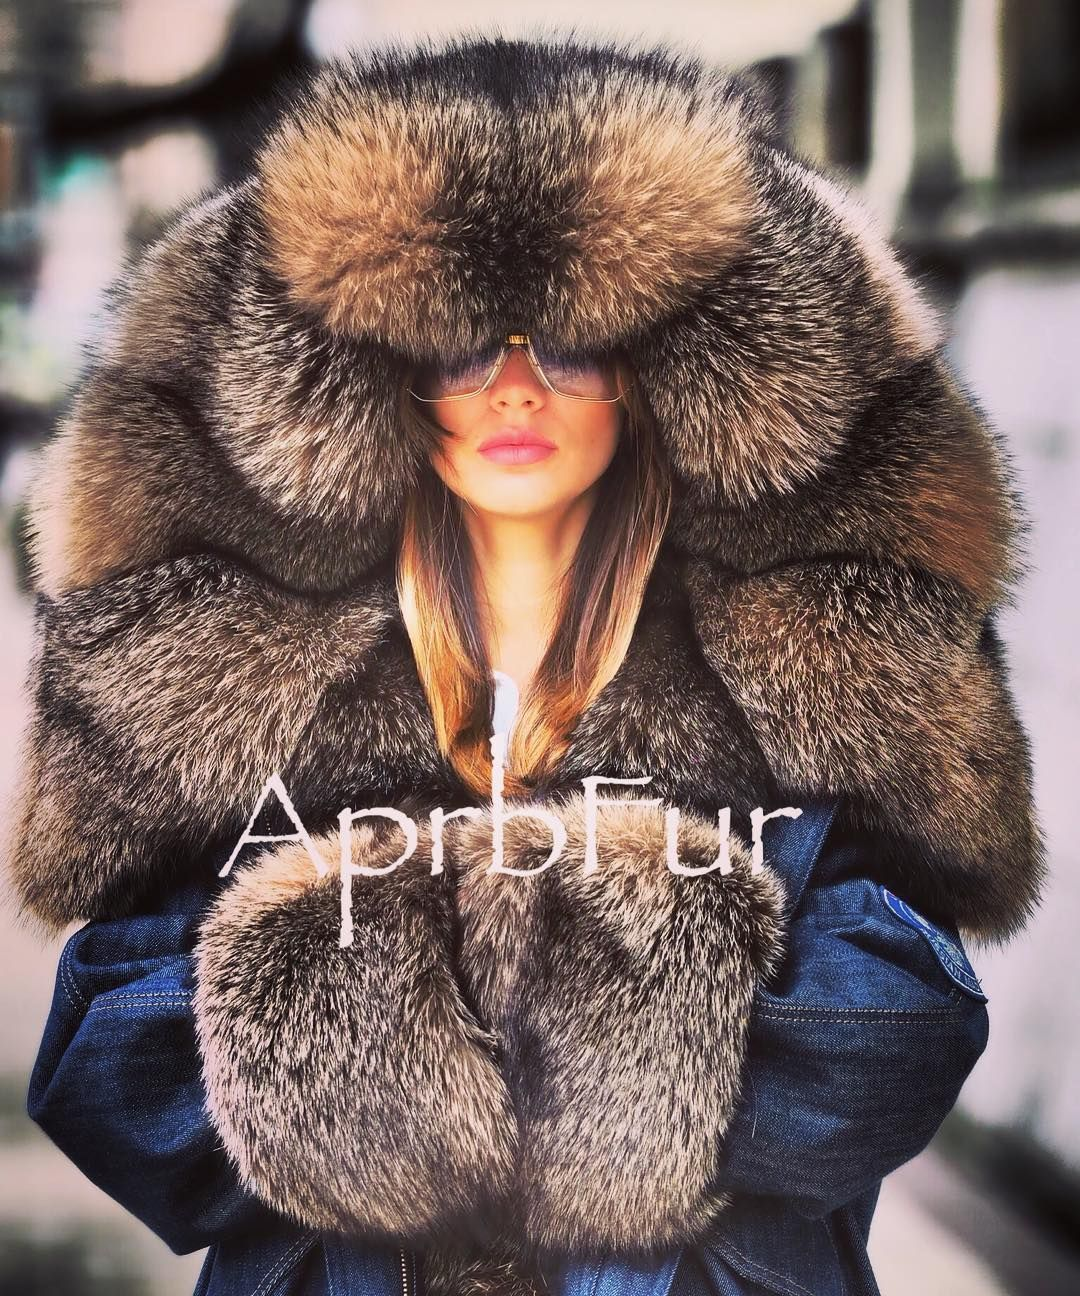 Pin By Celeste Perez On Fabulous Furs Fur Street Style Fur Fashion Fabulous Furs